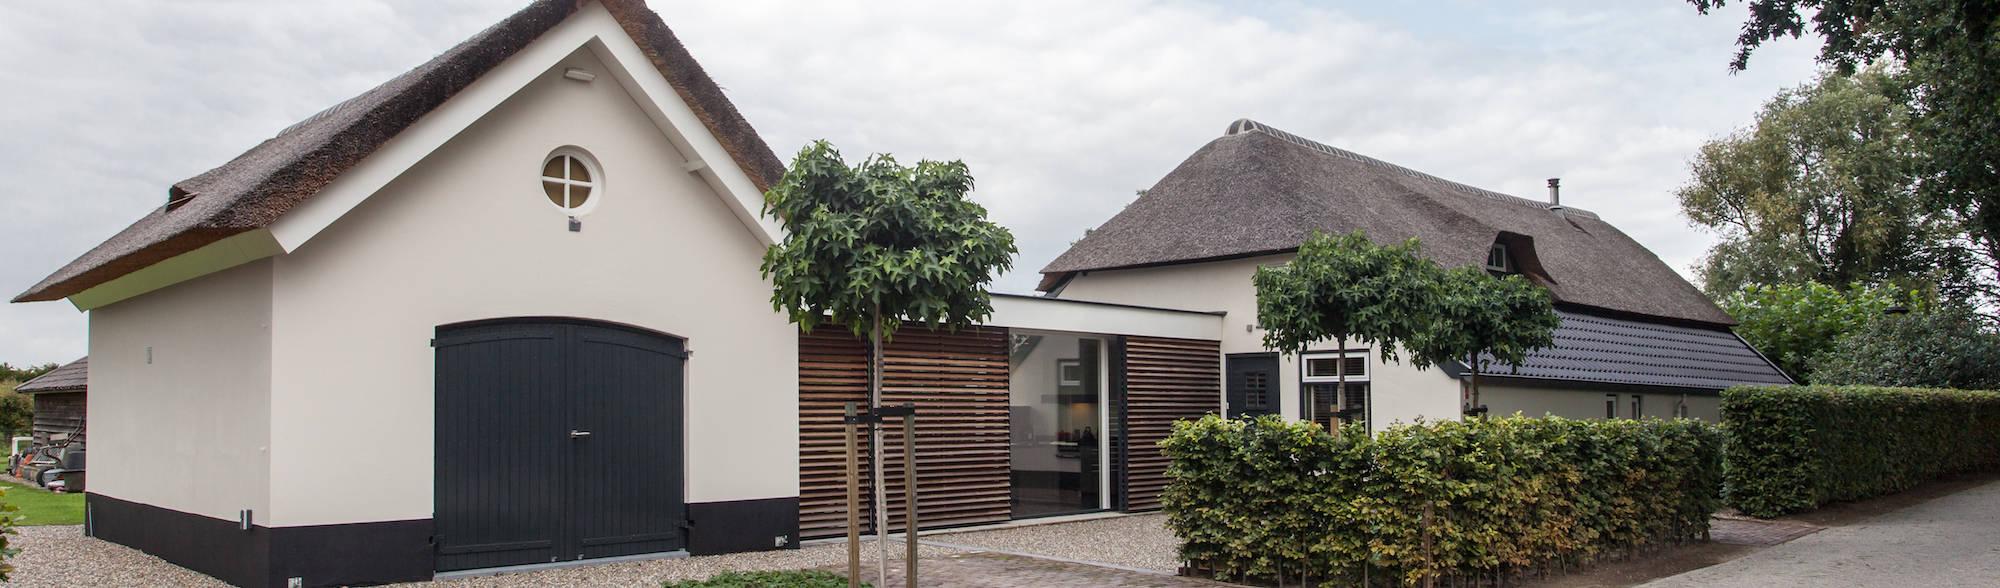 Bob Romijnders Architectuur & Interieur